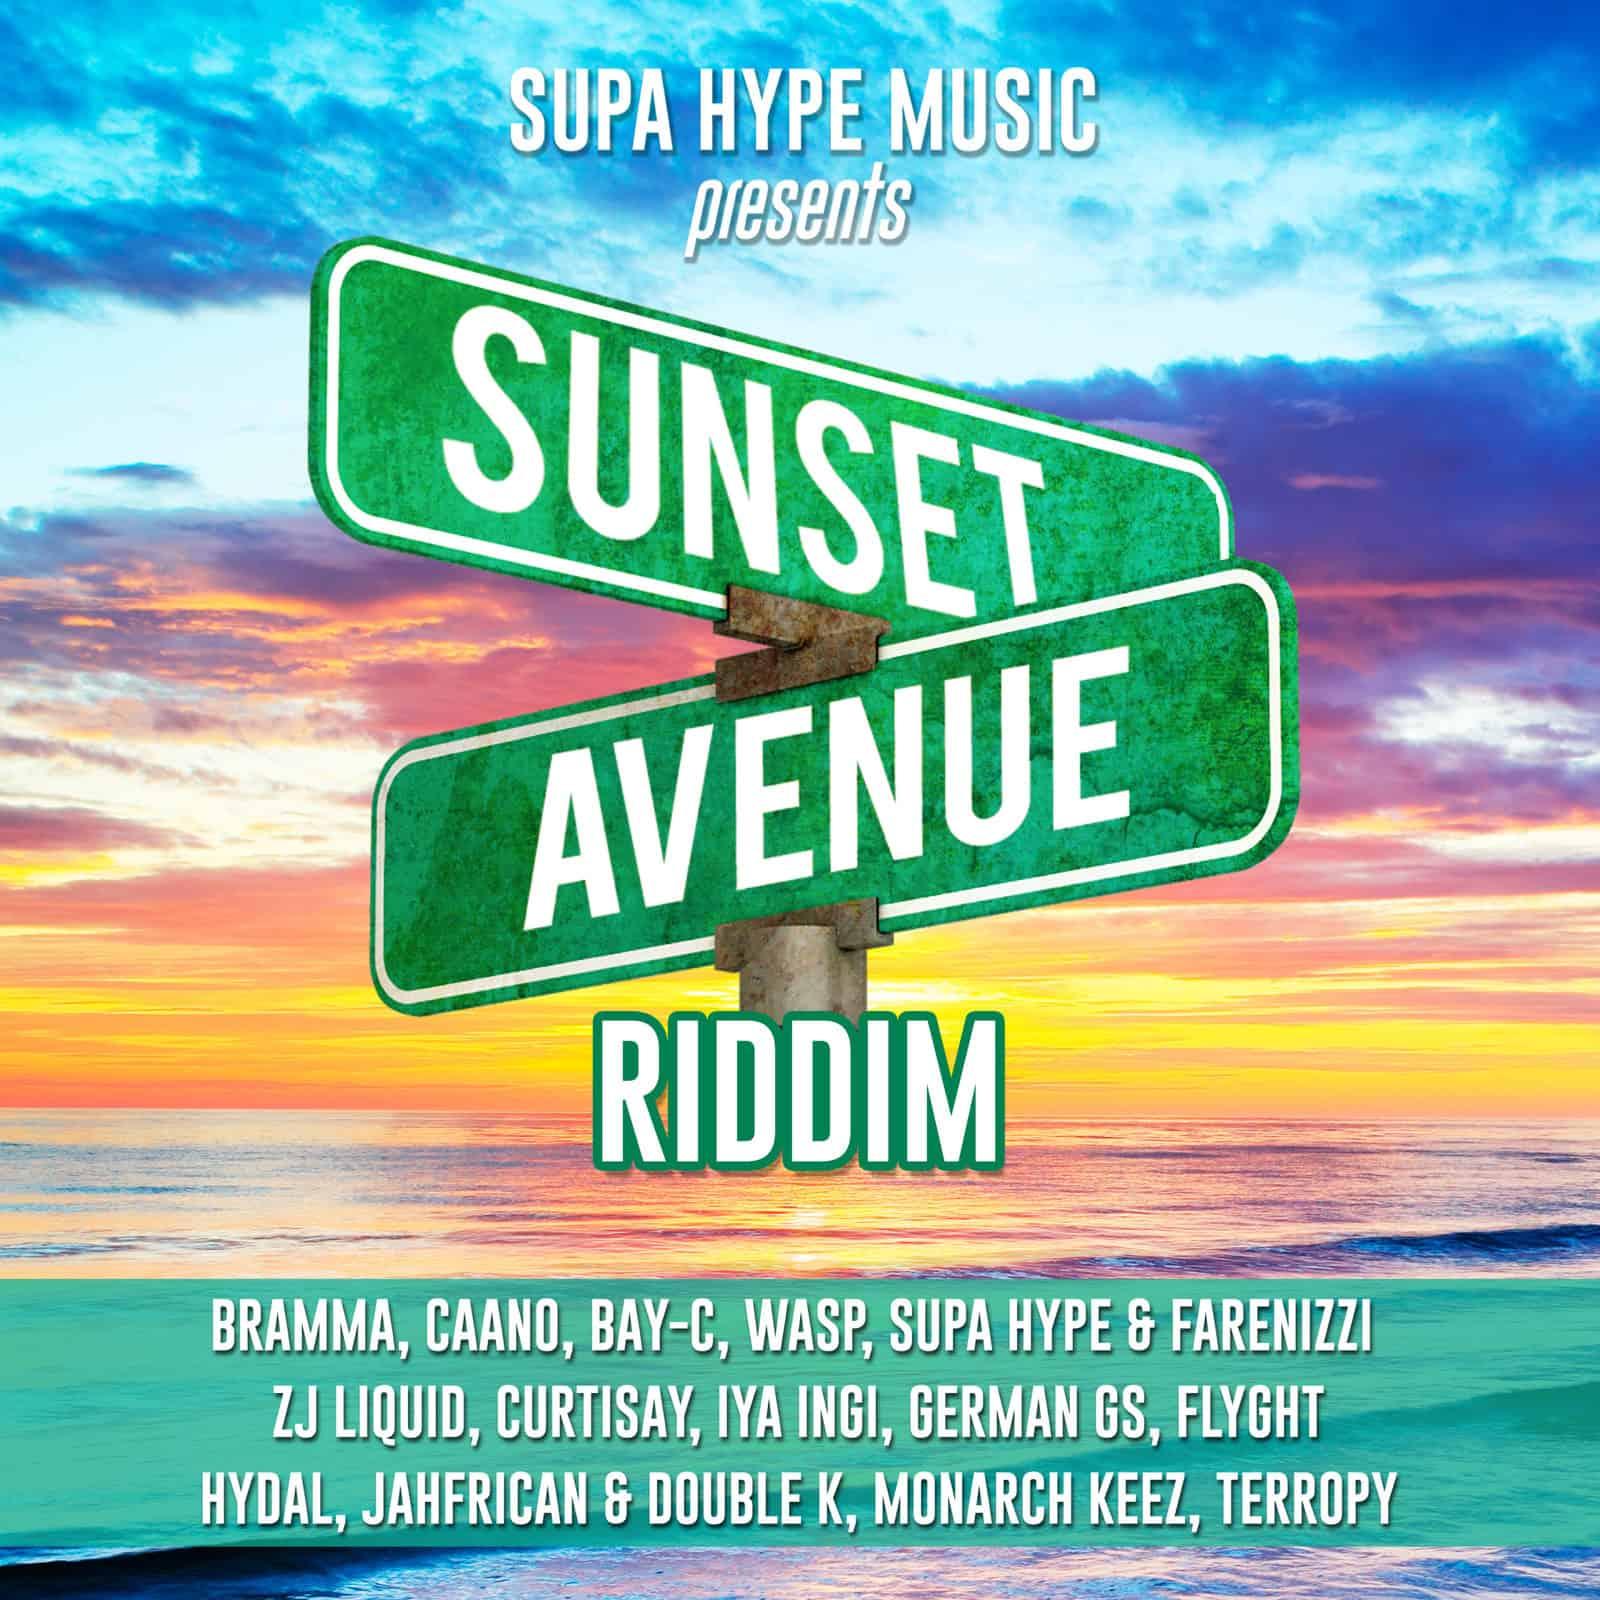 Sunset Avenue Riddim - Supa Hype Music